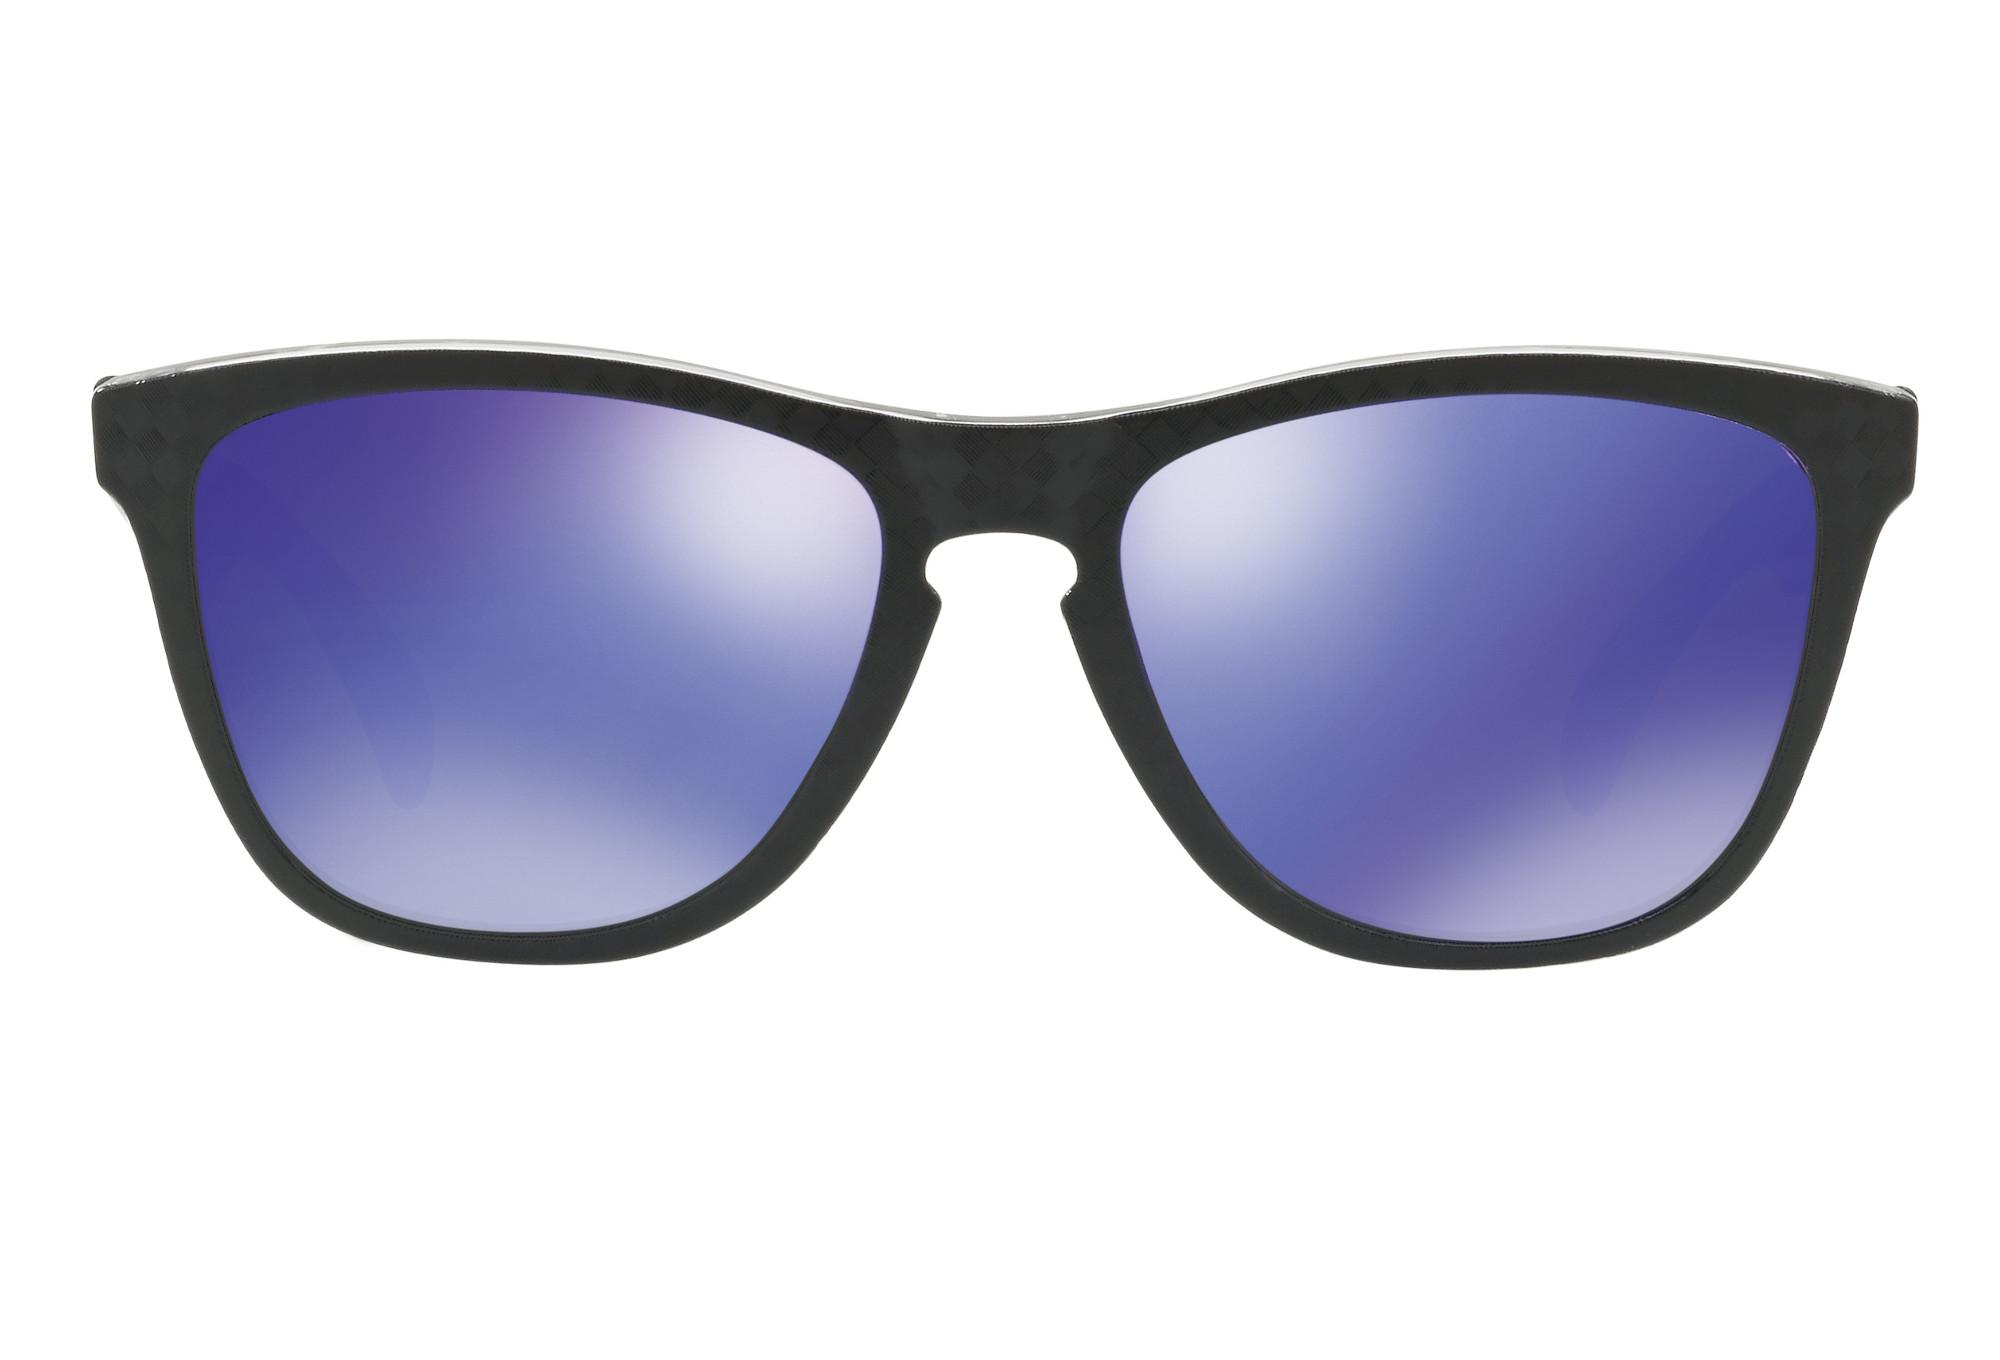 6dc412fa65c OAKLEY Sunglasses Frogskins Checkbox Black   Violet Iridium Ref  OO9013-B955